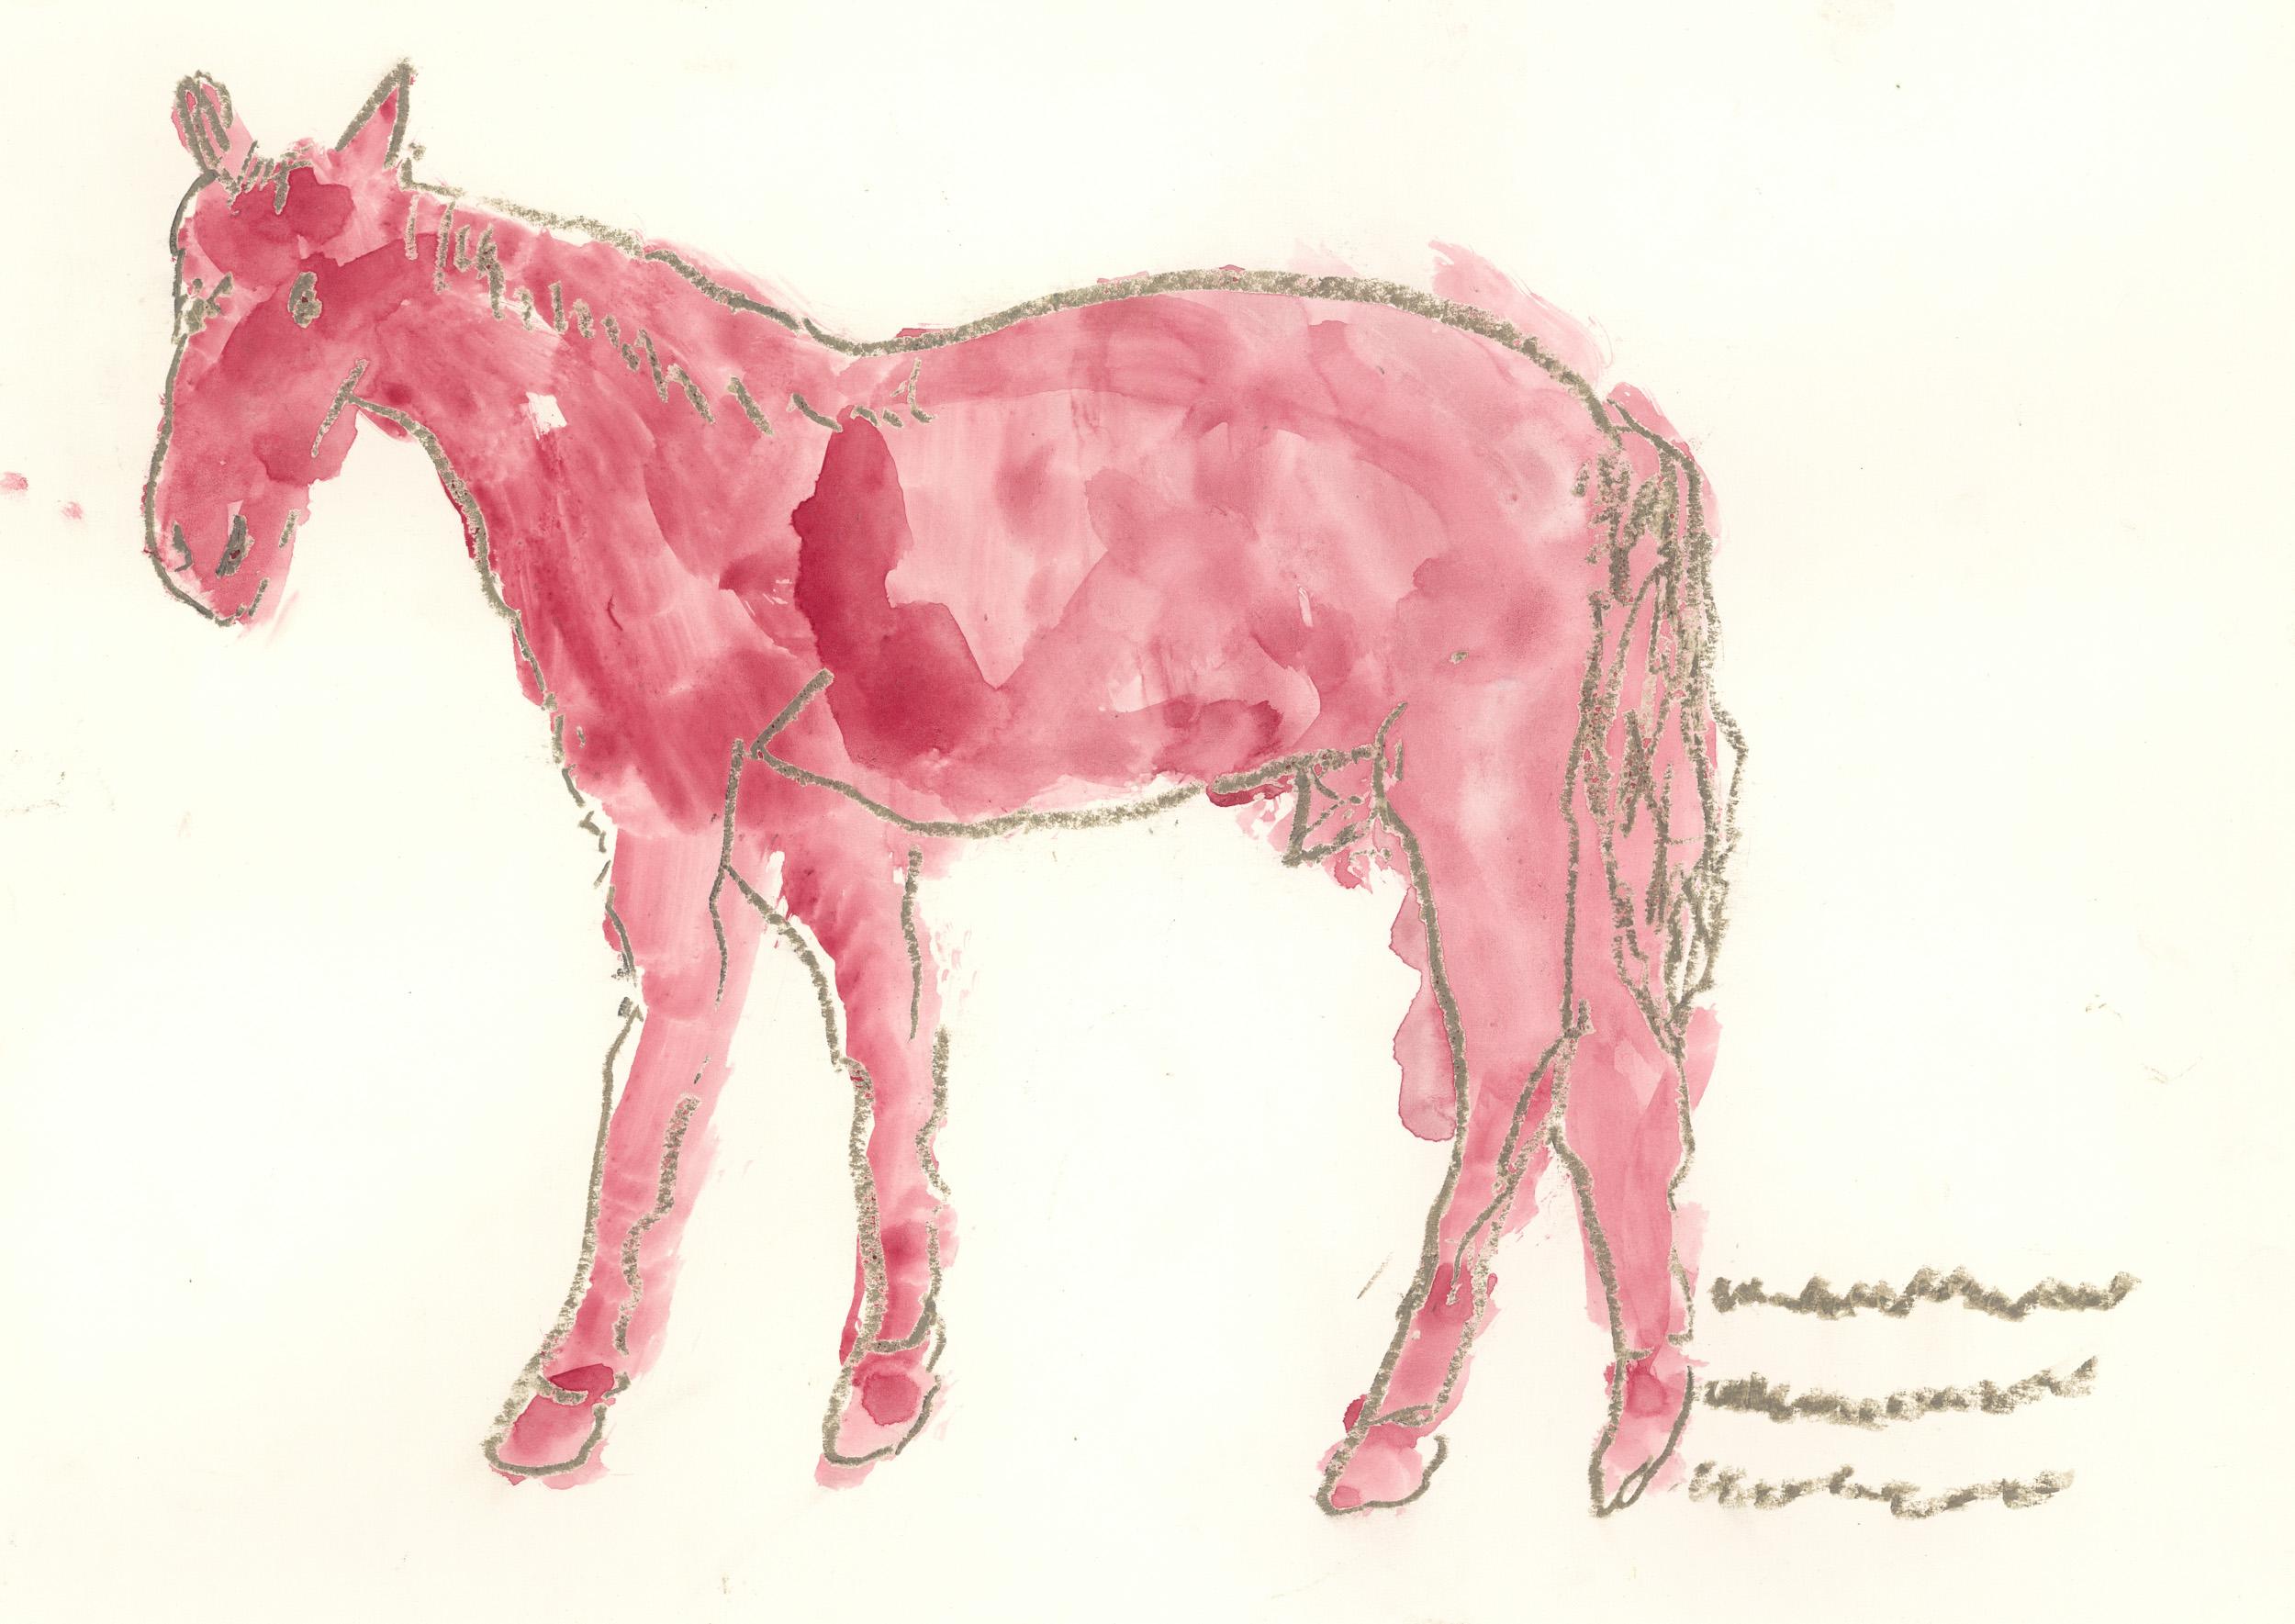 kamlander franz - Pferd / Horse